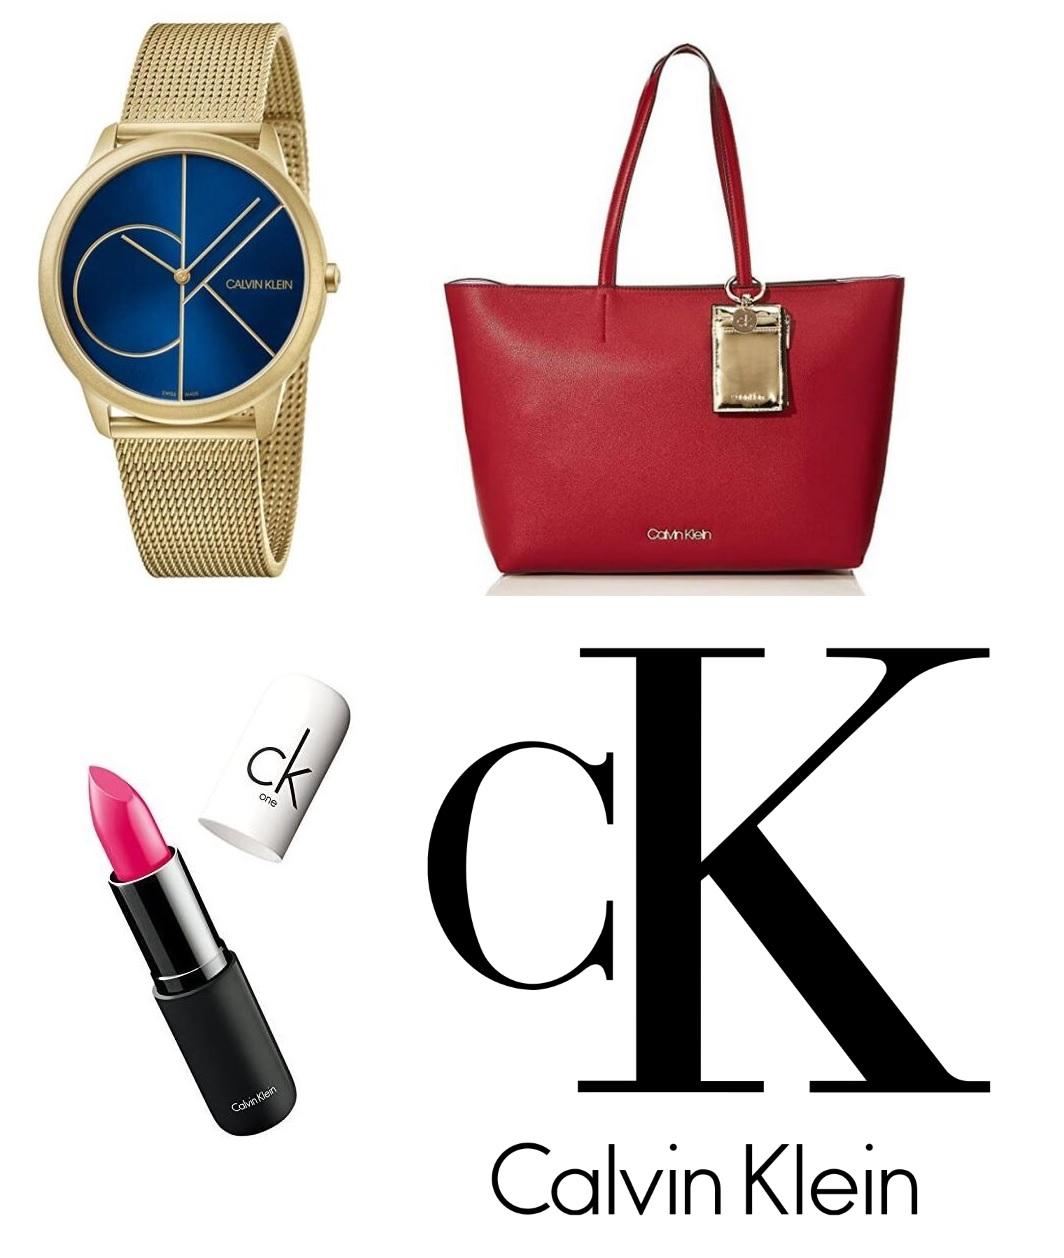 Mini-Recopilatorio CALVIN KLEIN (Bolso + reloj + pintalabios)